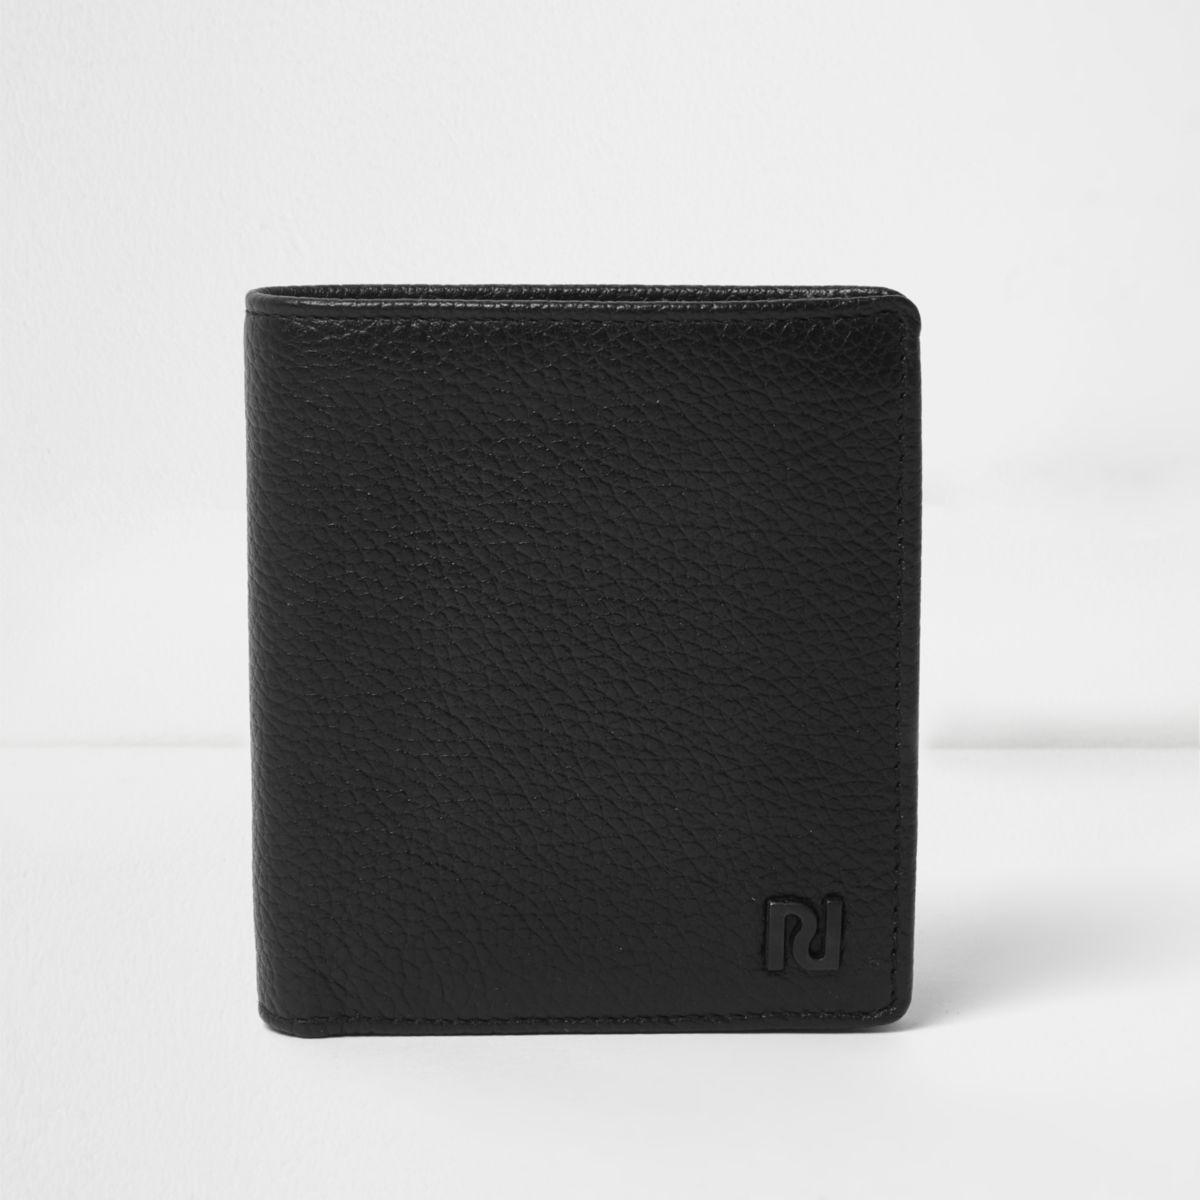 Portefeuille en cuir noir